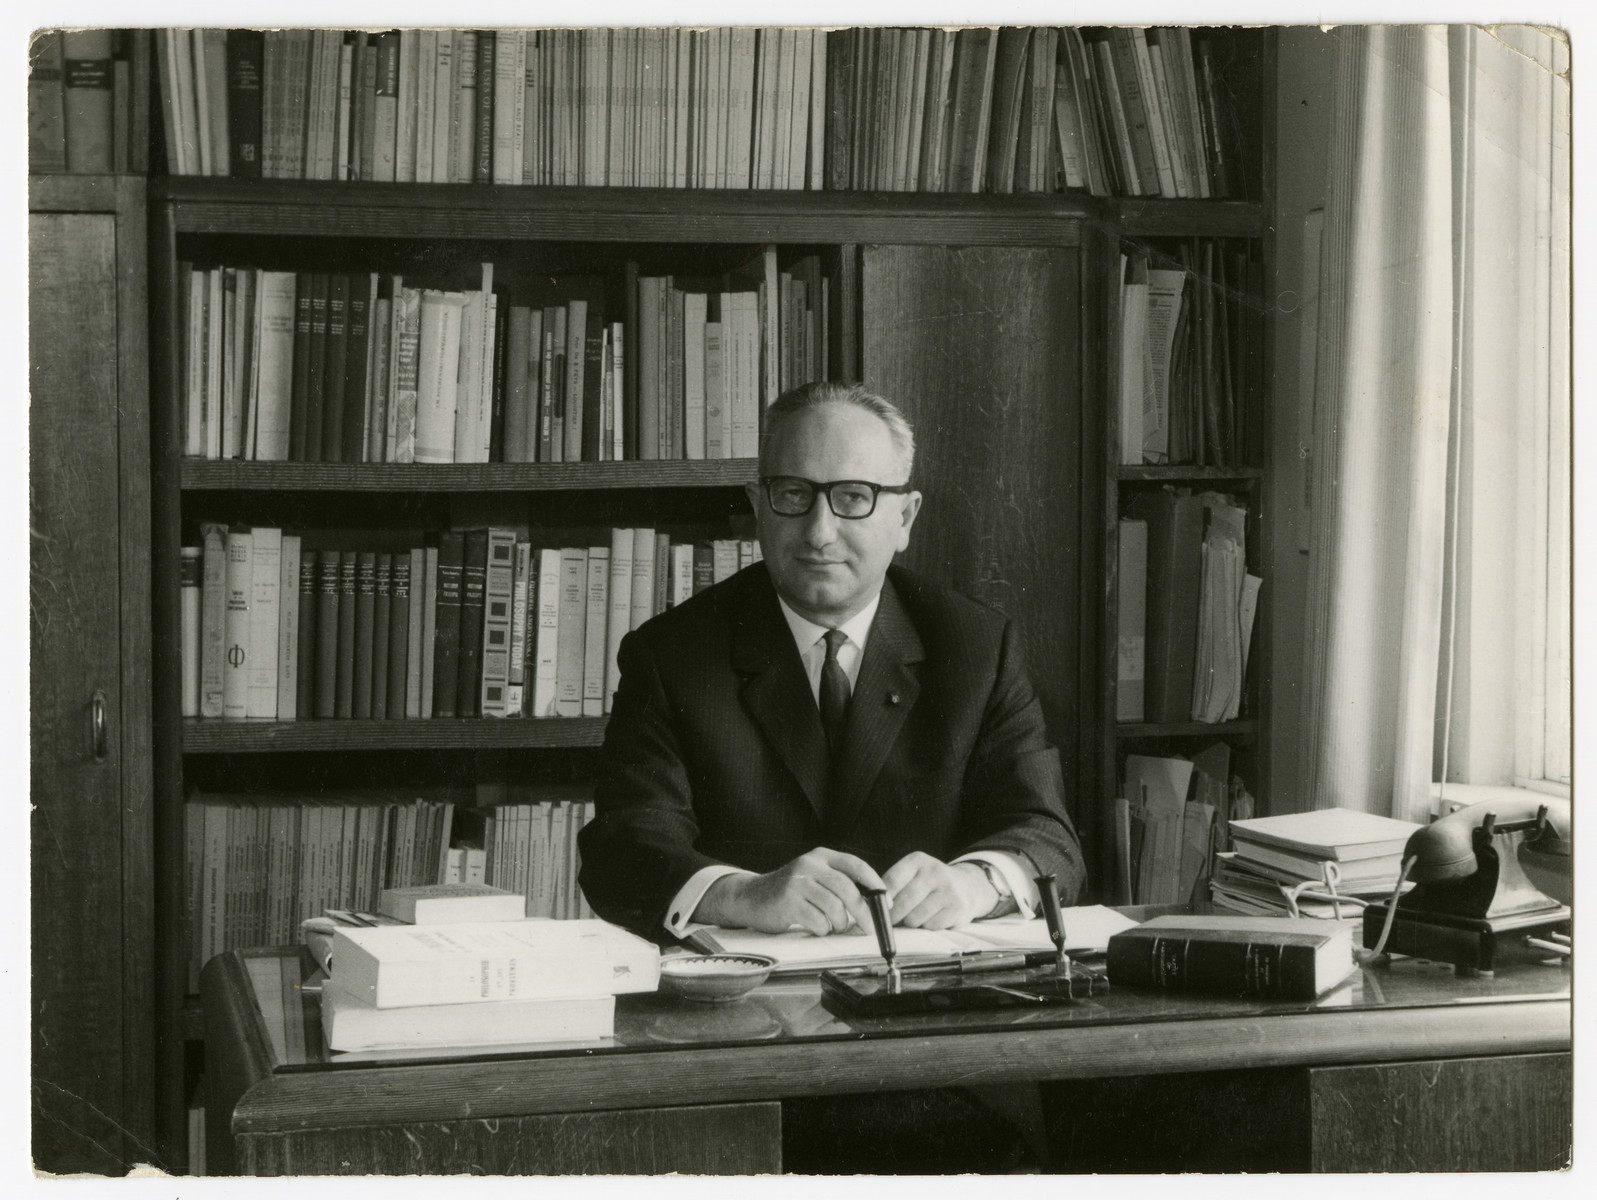 Close-up portrait of Chaim Perelman sitting at his desk.